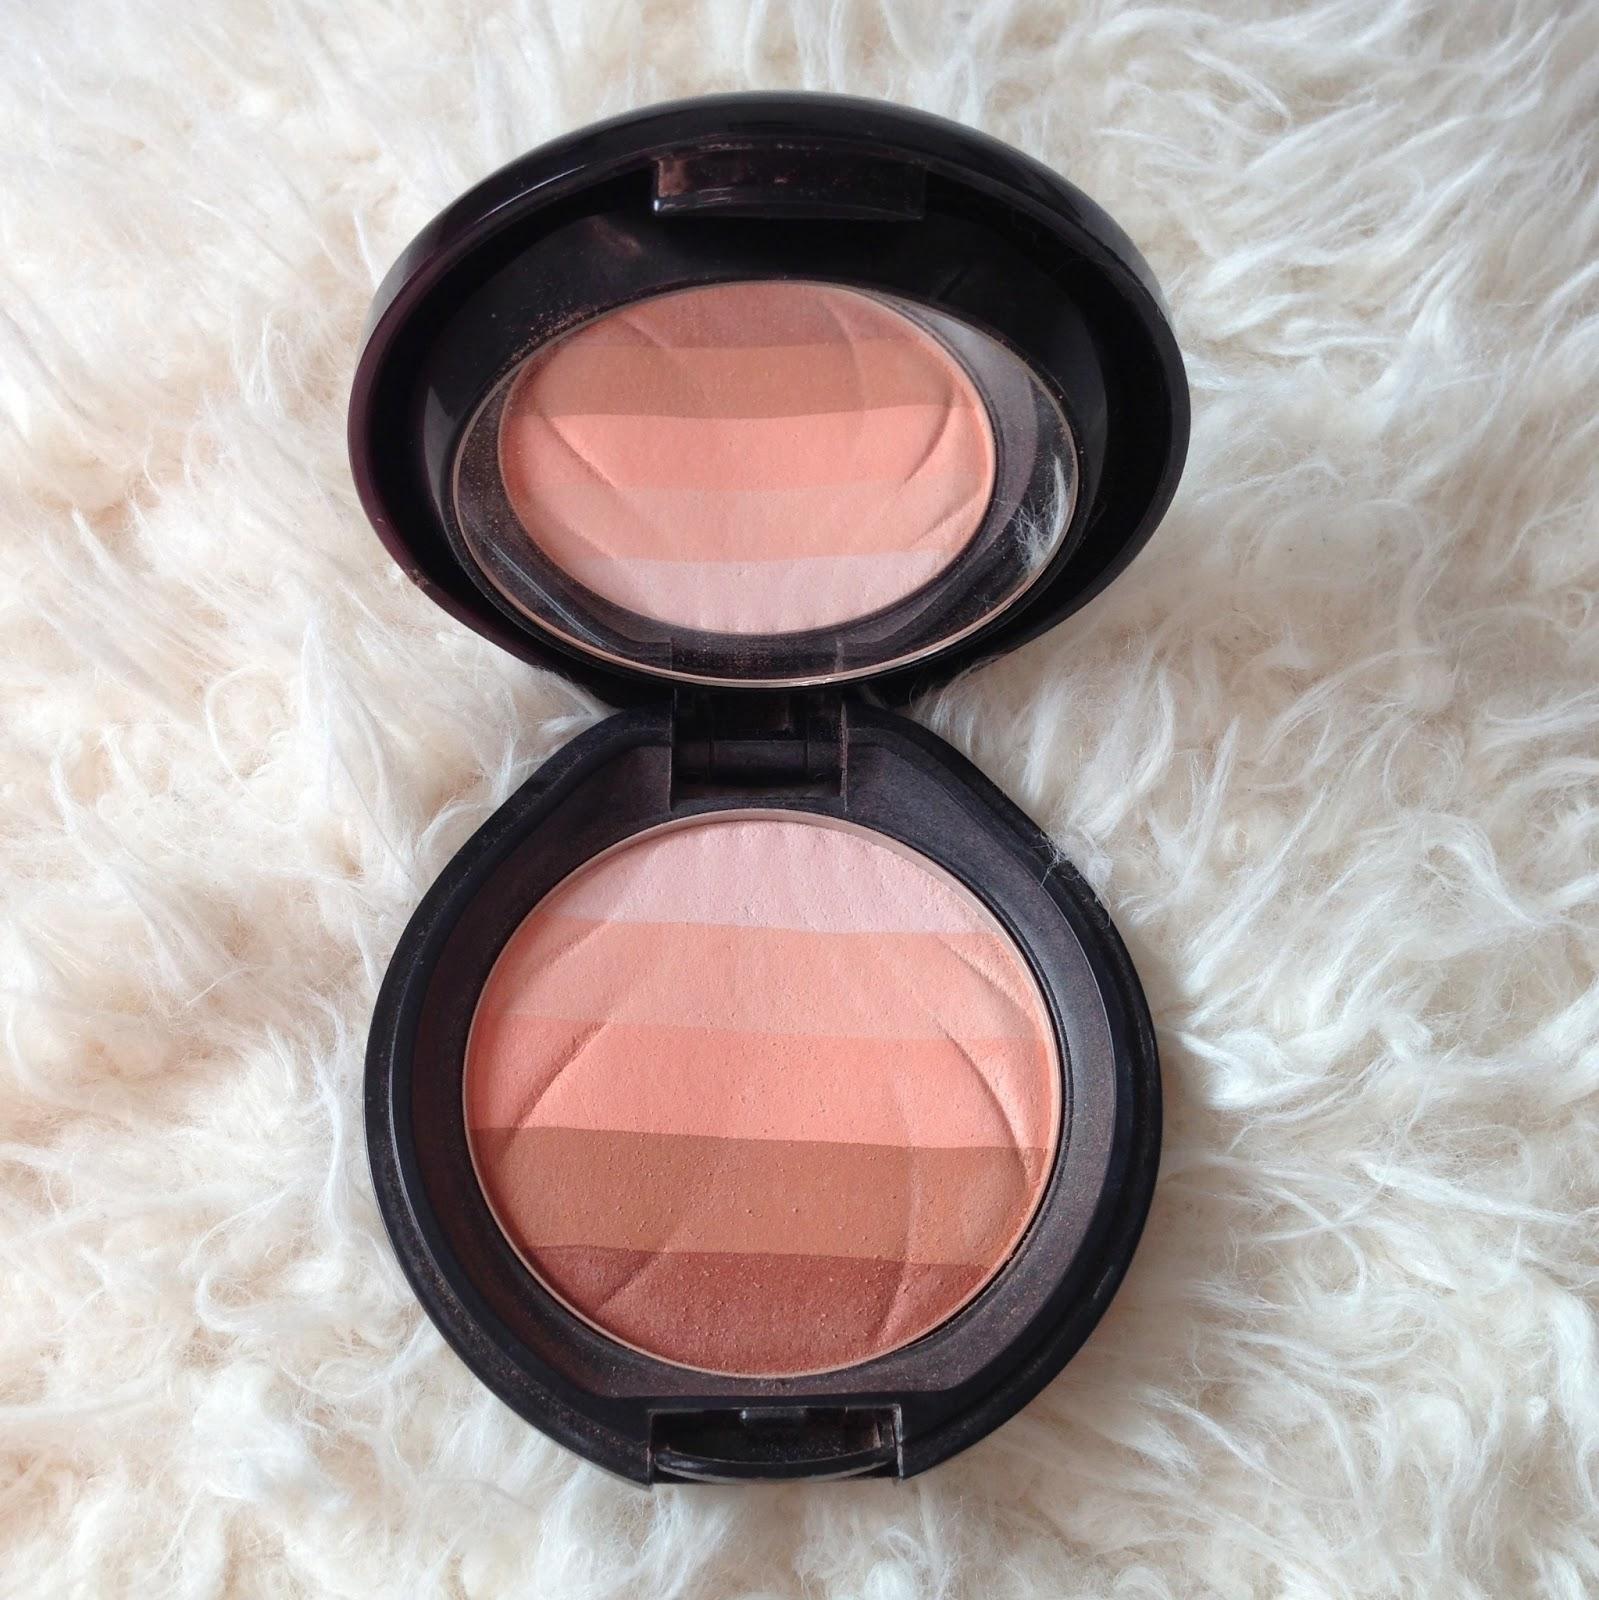 Shiseido Multi-Shade Enhancer in Sunset Glow